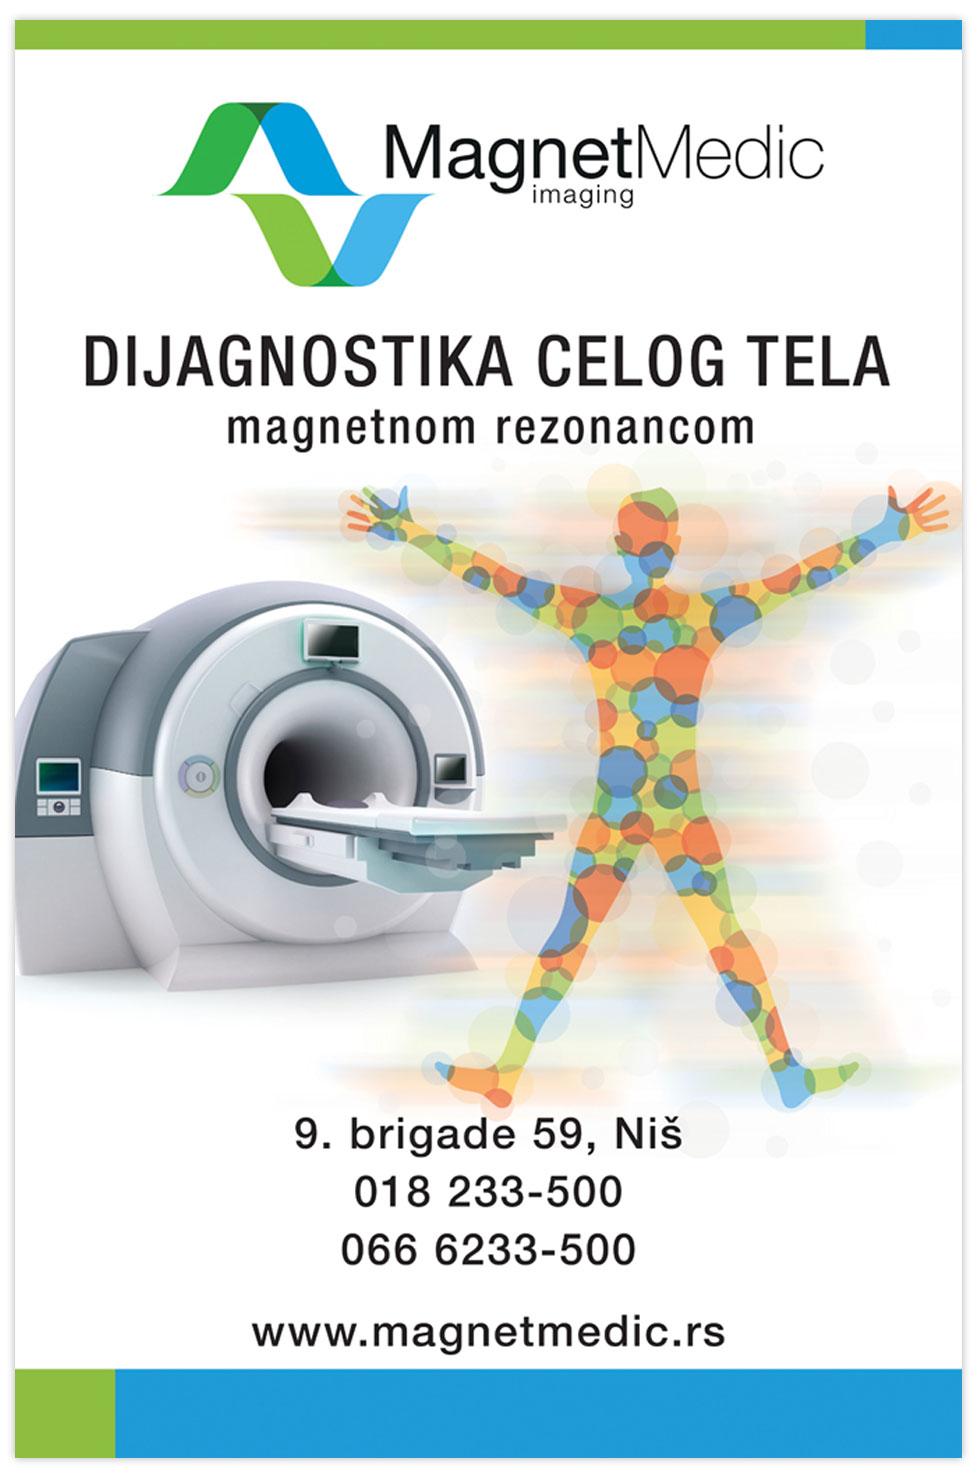 magnet medic poster 3